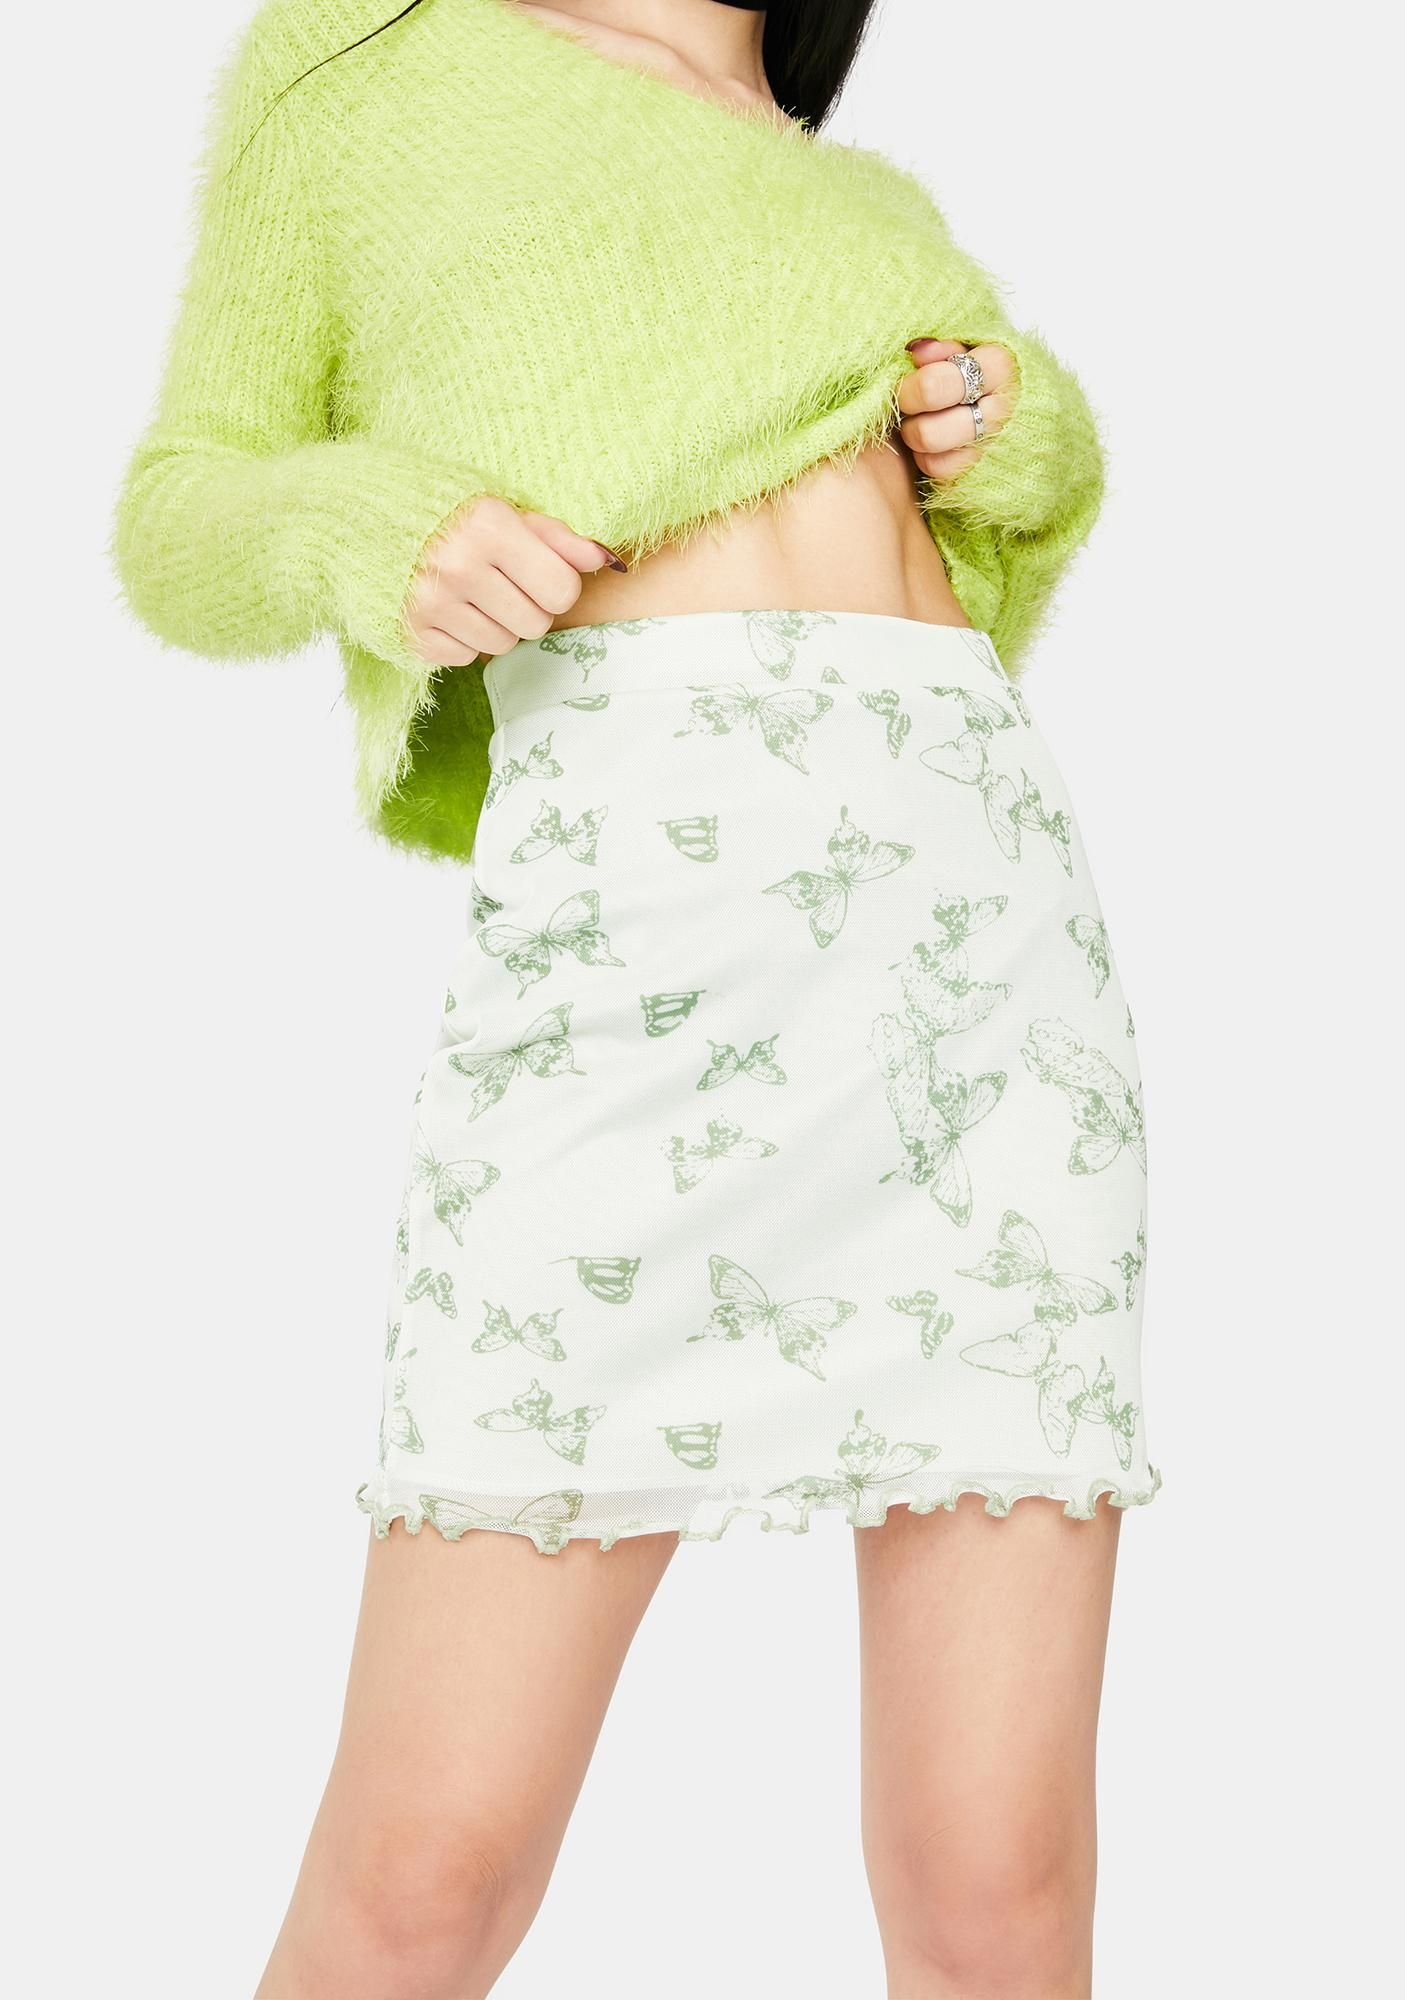 Mesh mini skirts online Butterfly Mesh Mini Skirt Mini Skirts Vegan Leather Skirt Online Shopping Clothes